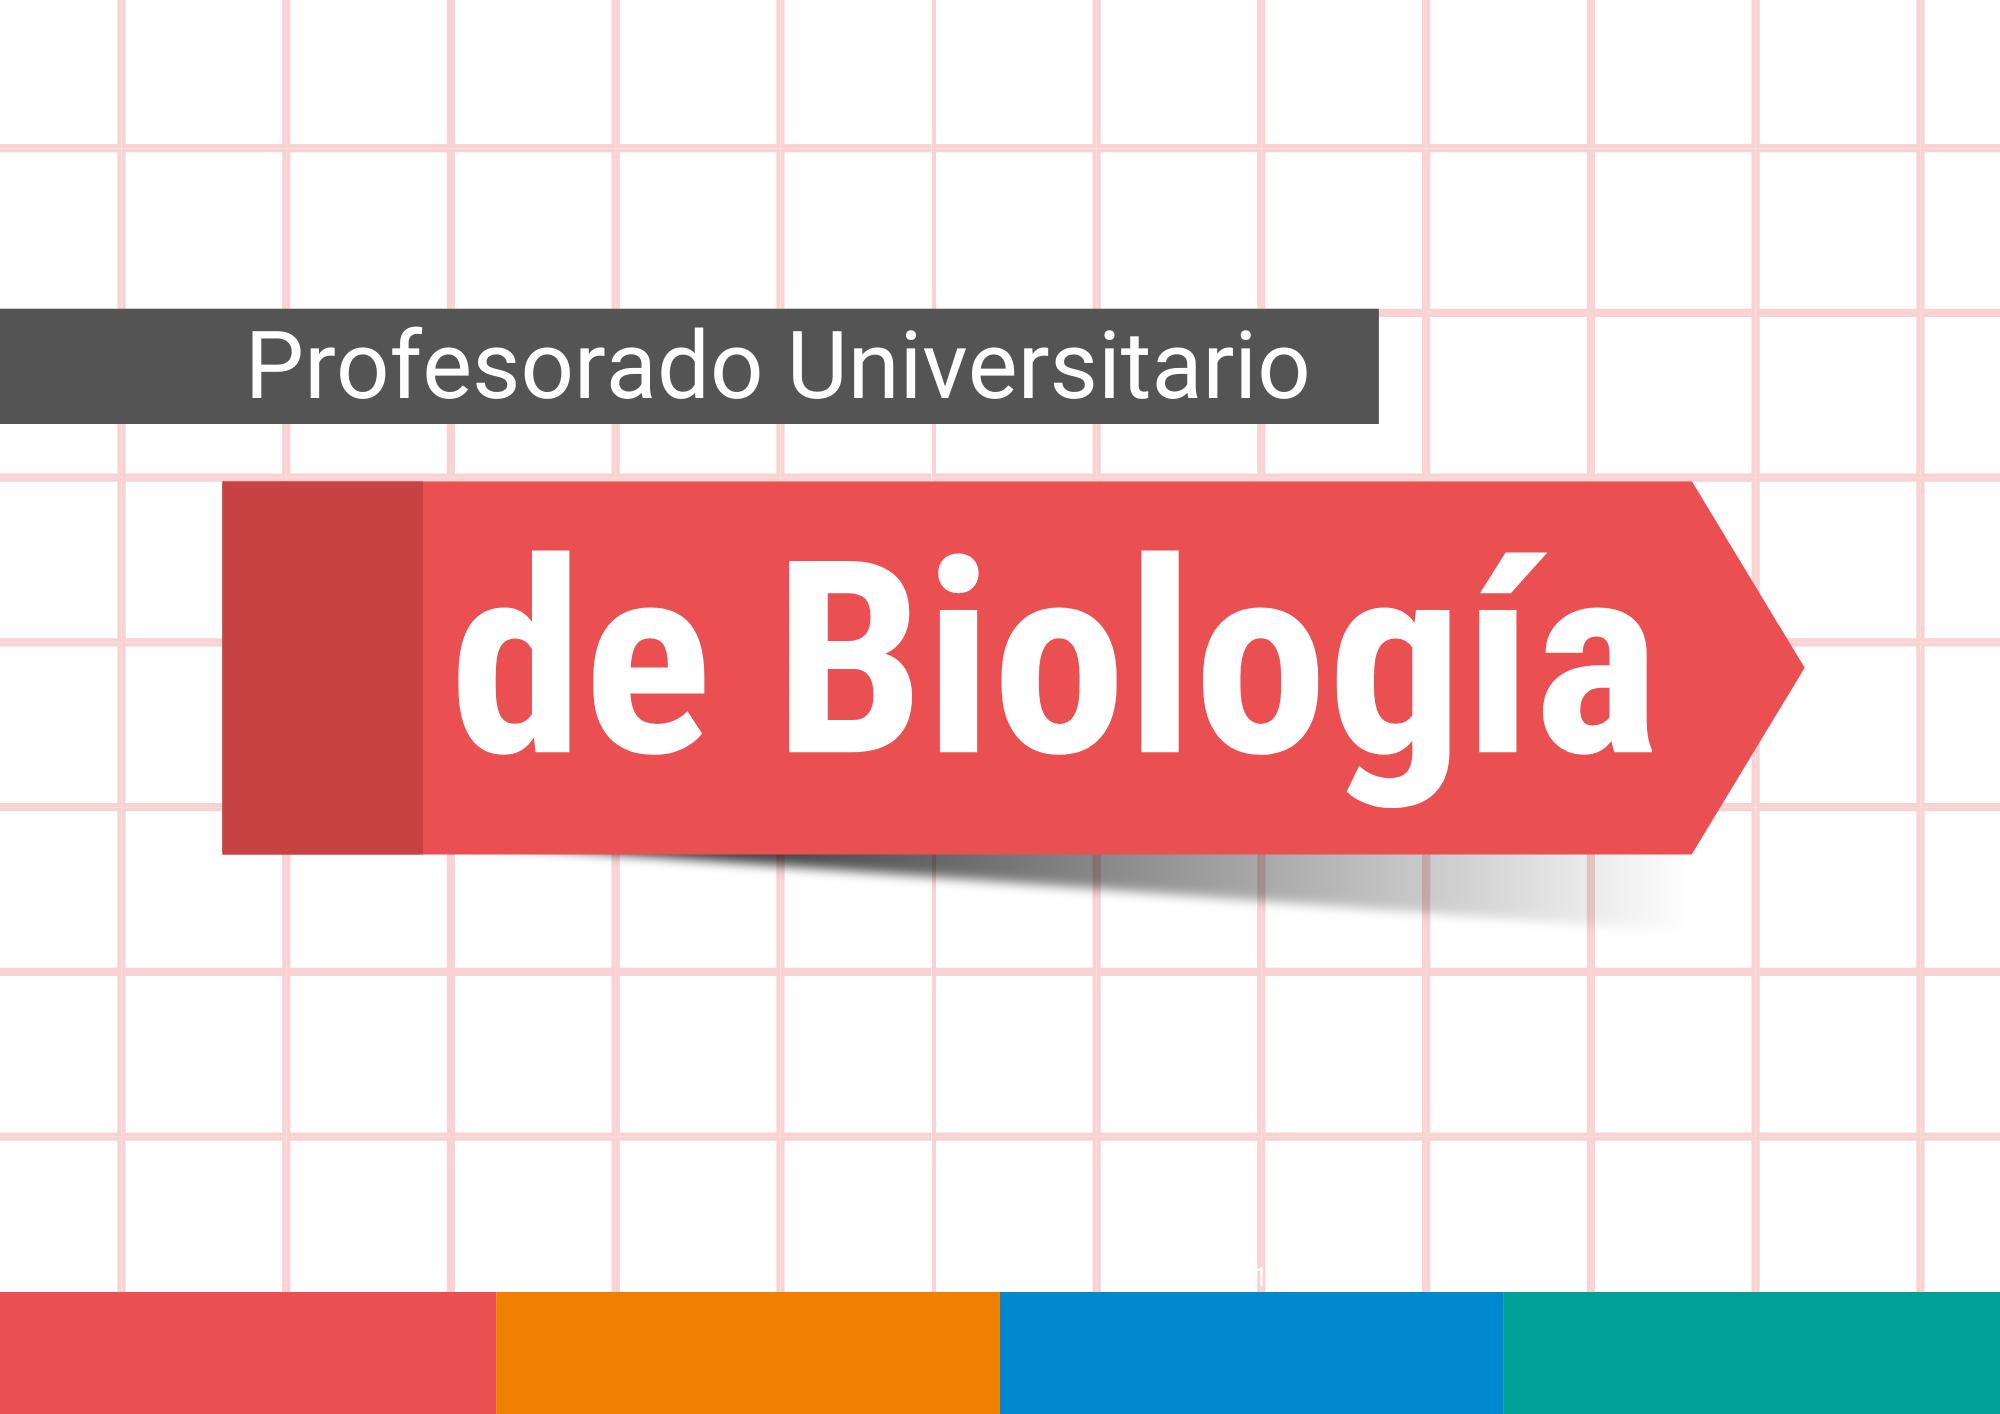 Prof Univ de Biologia